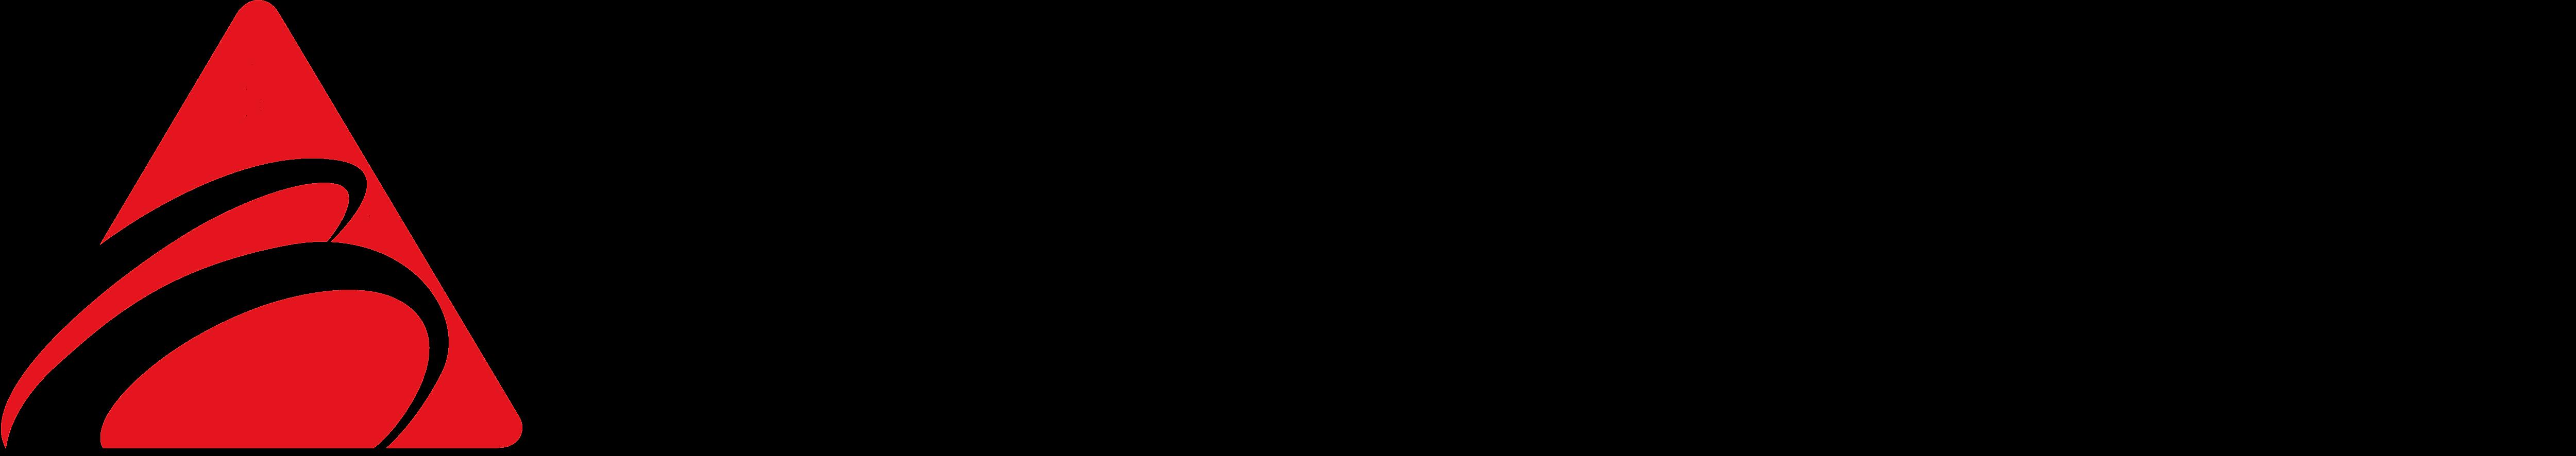 Resultado de imagen para biostar logo